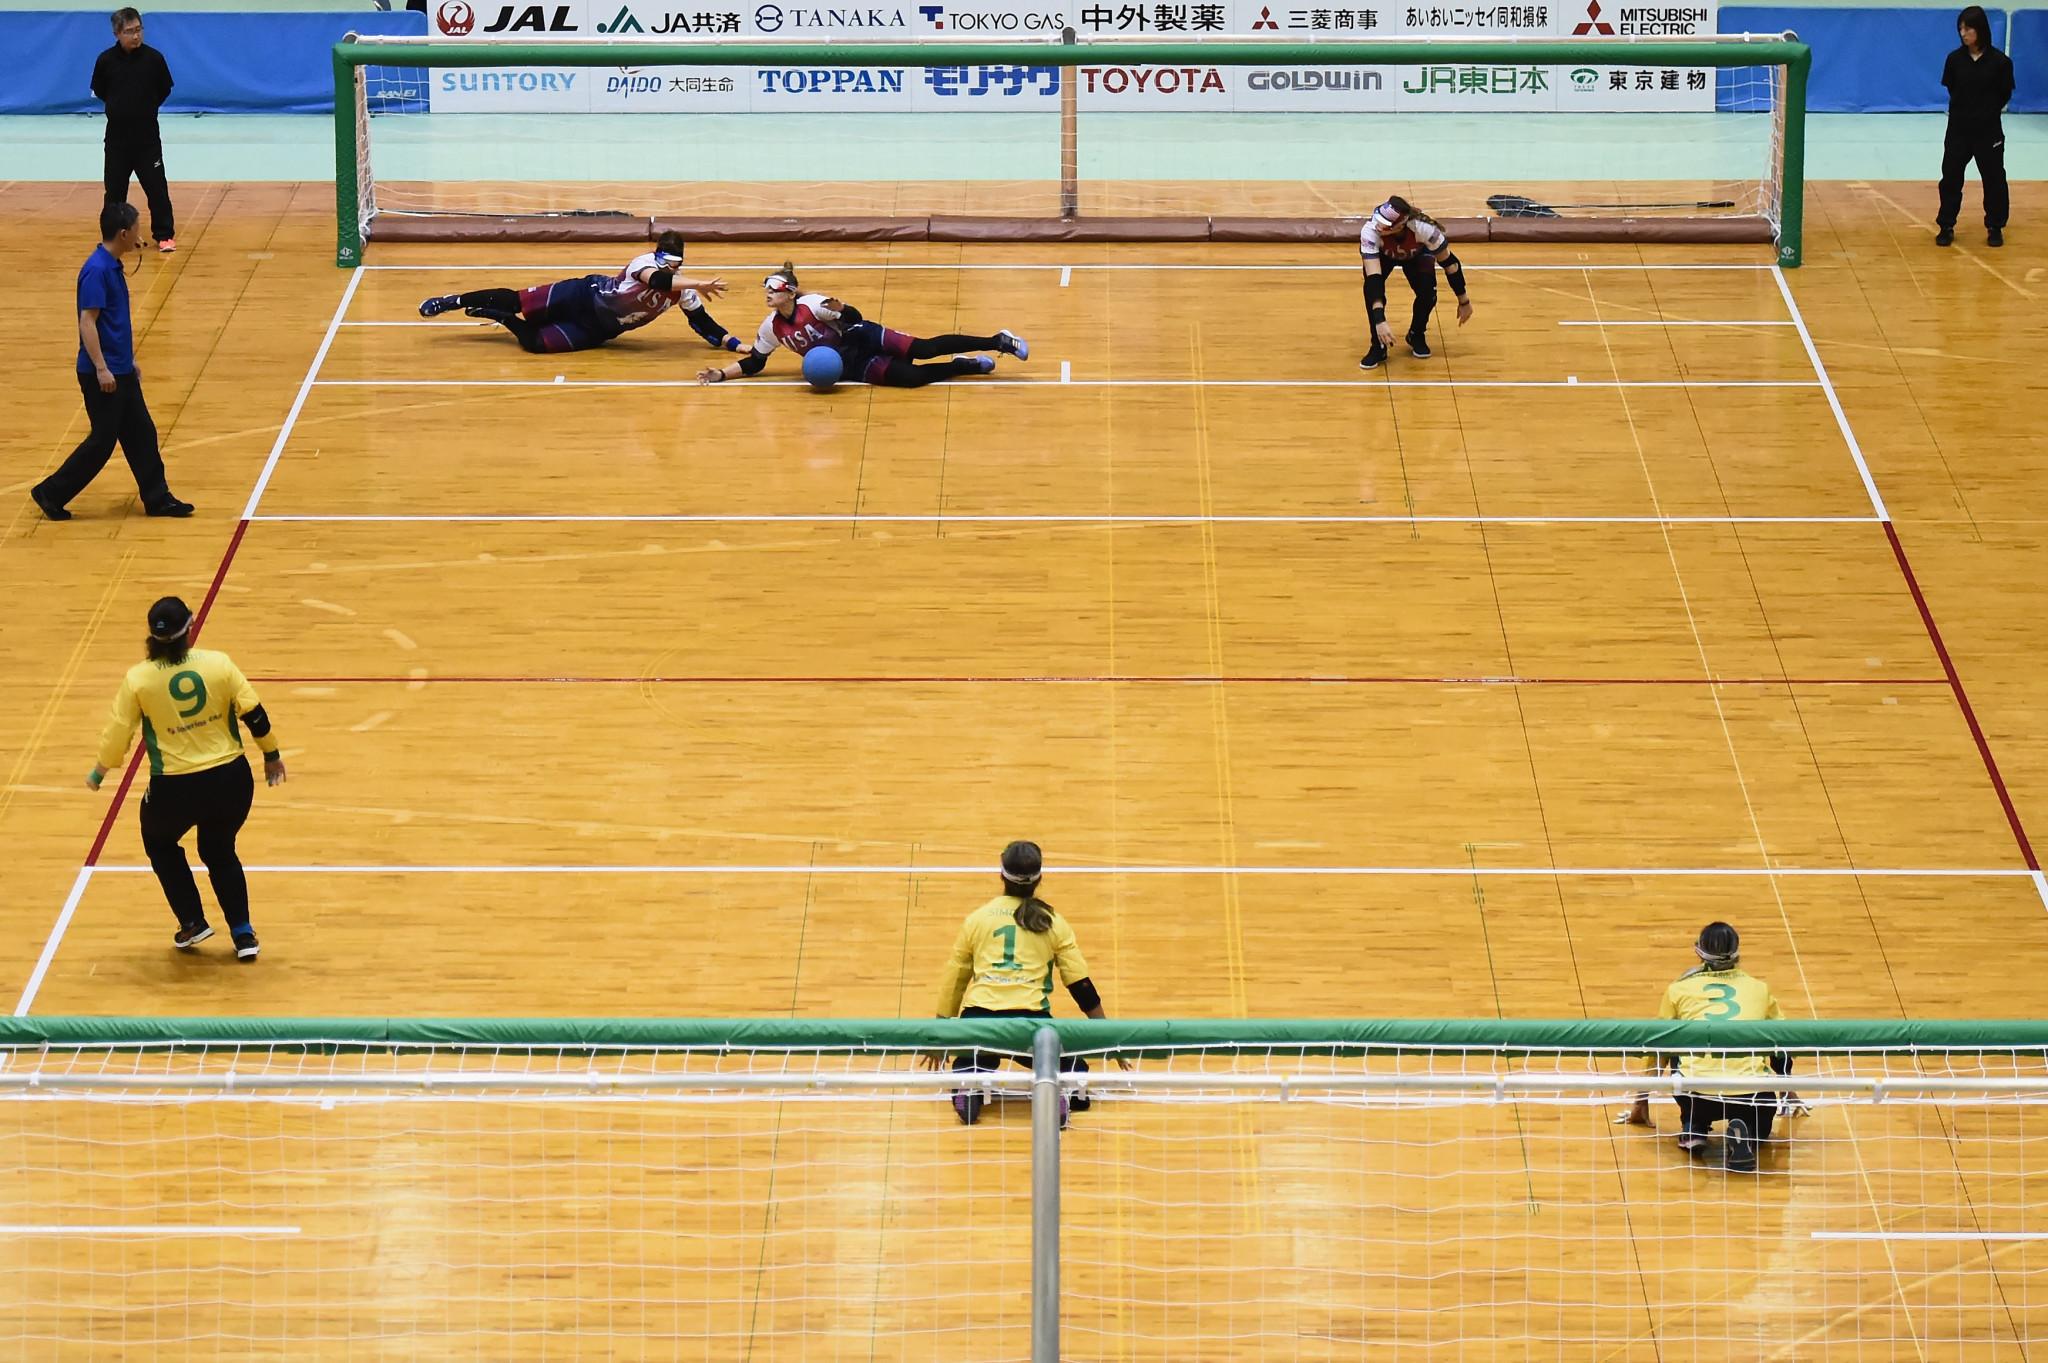 Bidding process opened for 2022 Goalball World Championships